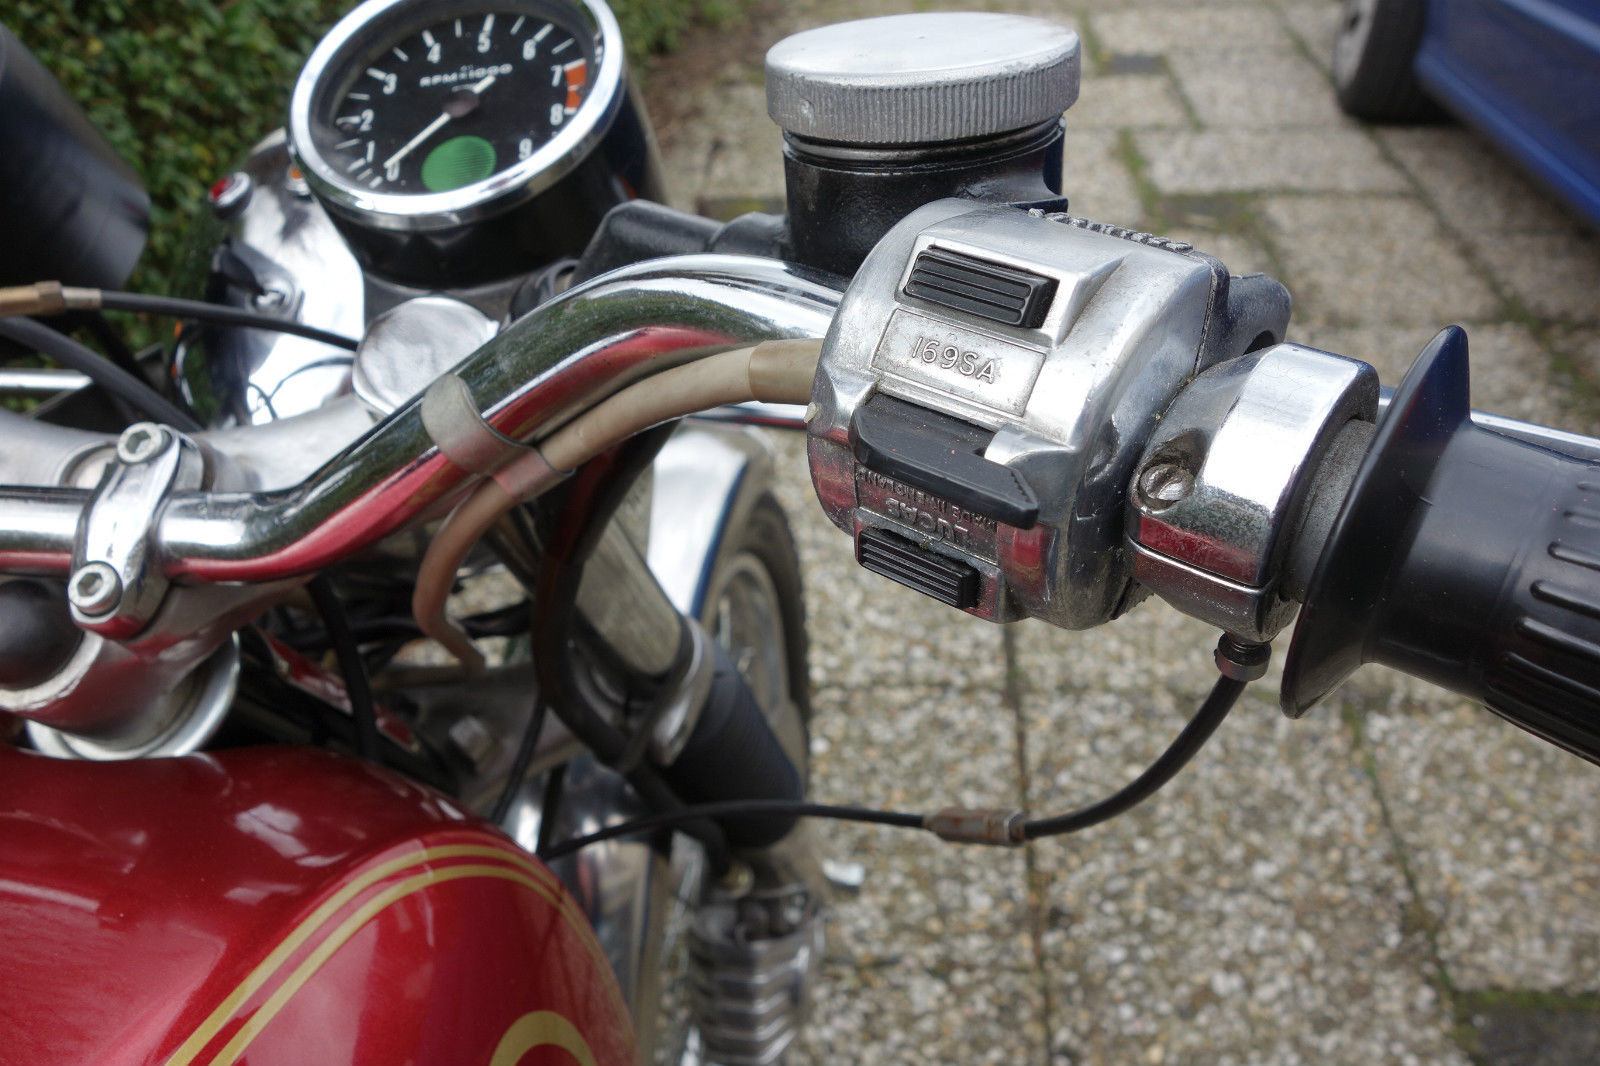 Norton Commando 750 - 1971 - New RH Switch, Handlebars, Brake and Throttle.